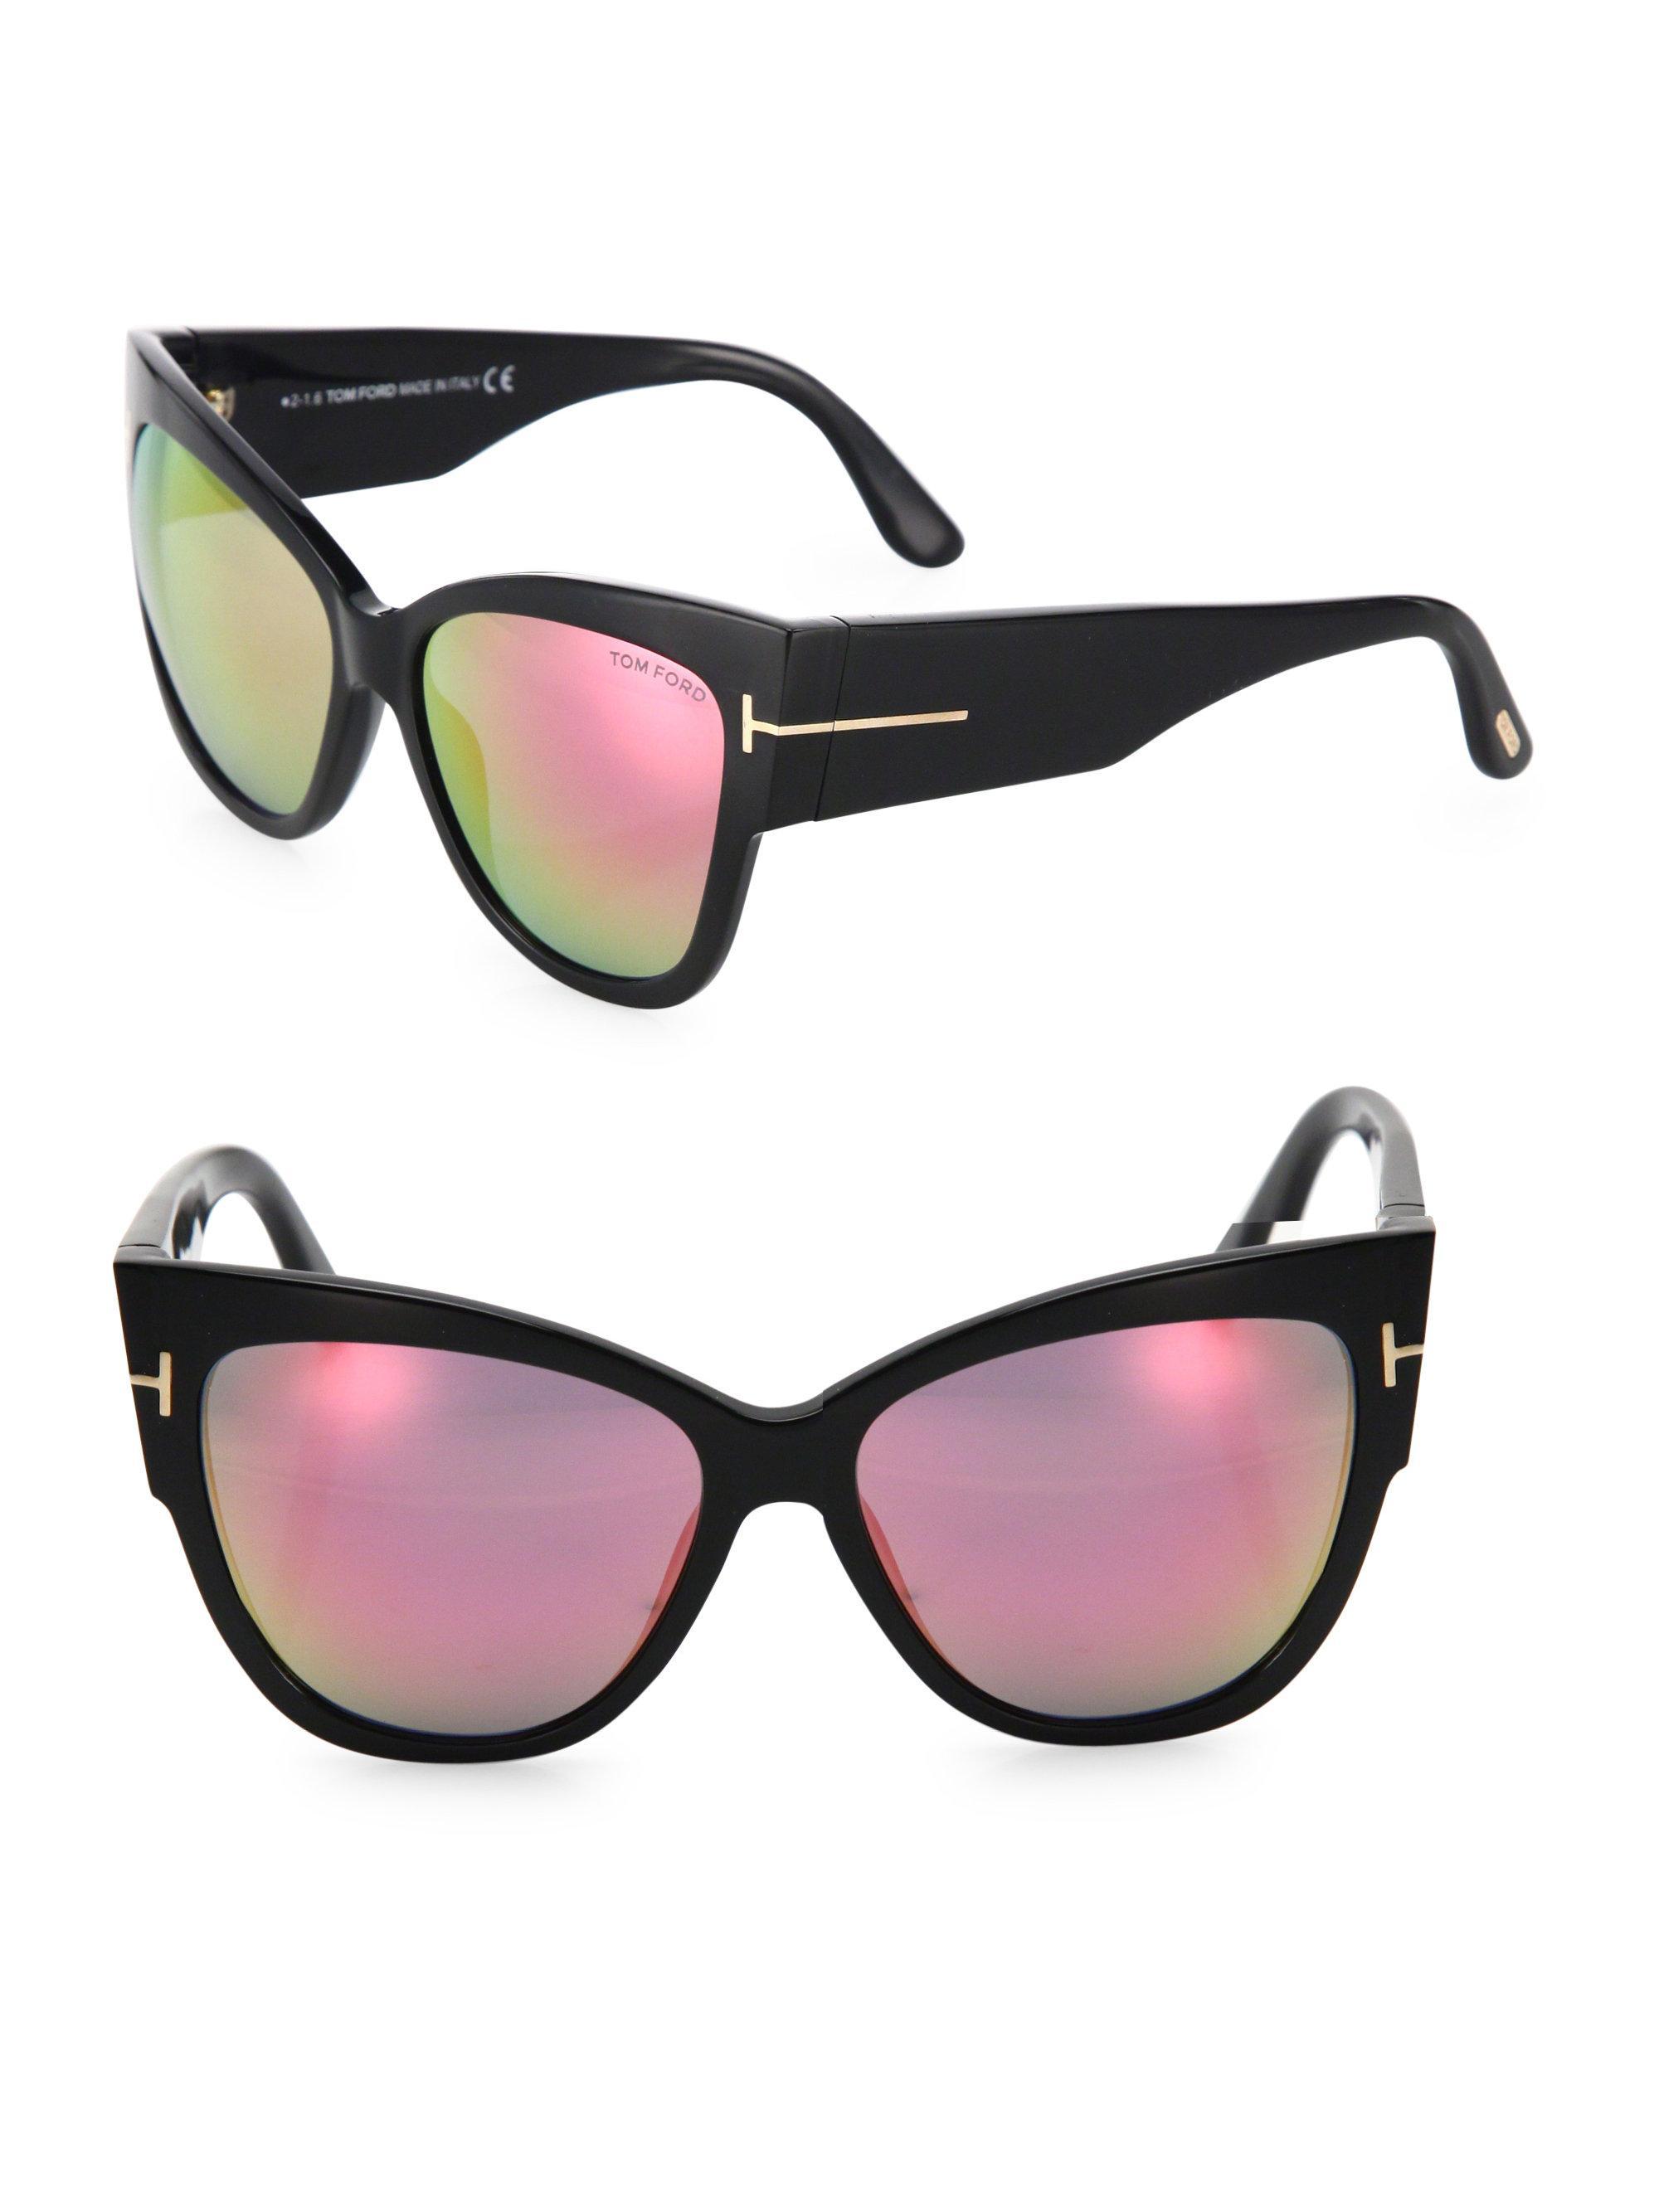 5b70dd968315 Lyst - Tom Ford Anoushka 57mm Mirrored Cat Eye Sunglasses